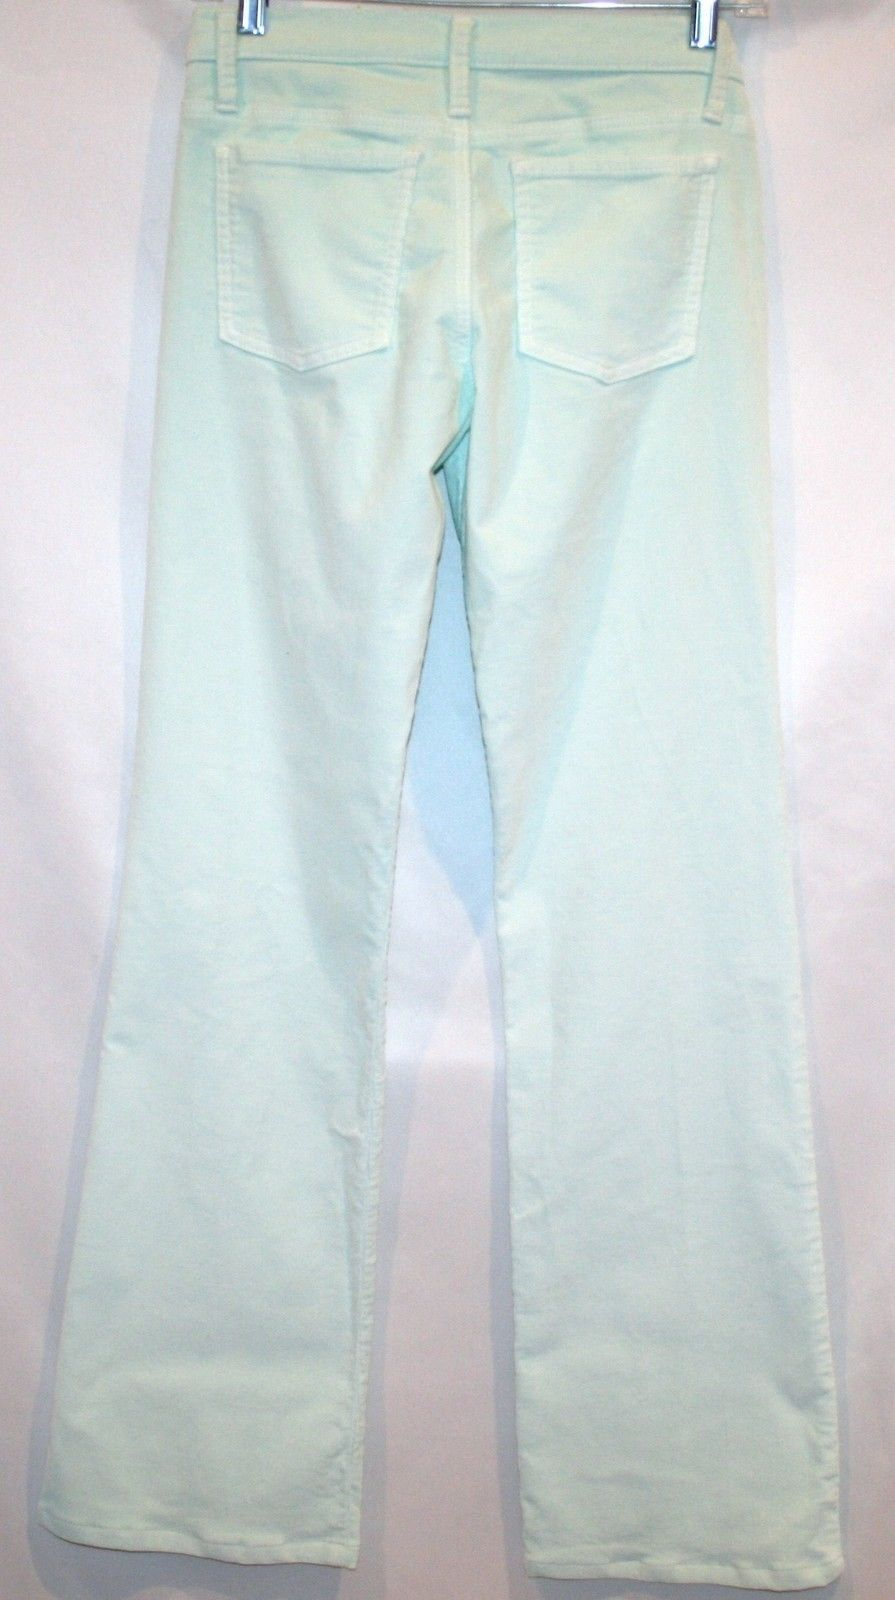 DEAD SEXY Stretch Corduroy Light Mint Pool 5 Pocket Boot Cut Pant Size 26